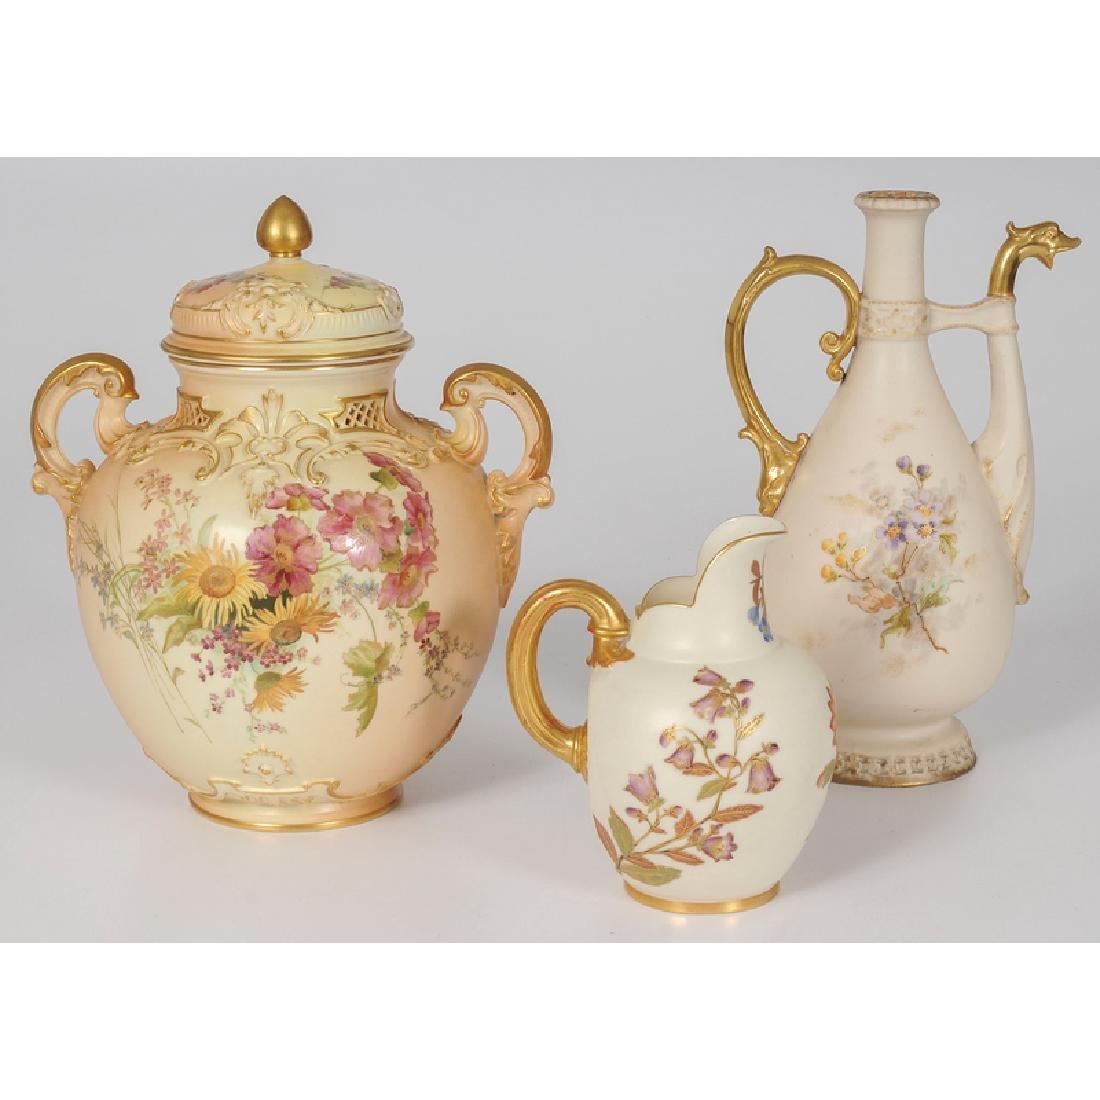 Royal Worcester Lidded Jar and Creamer and Teplitz